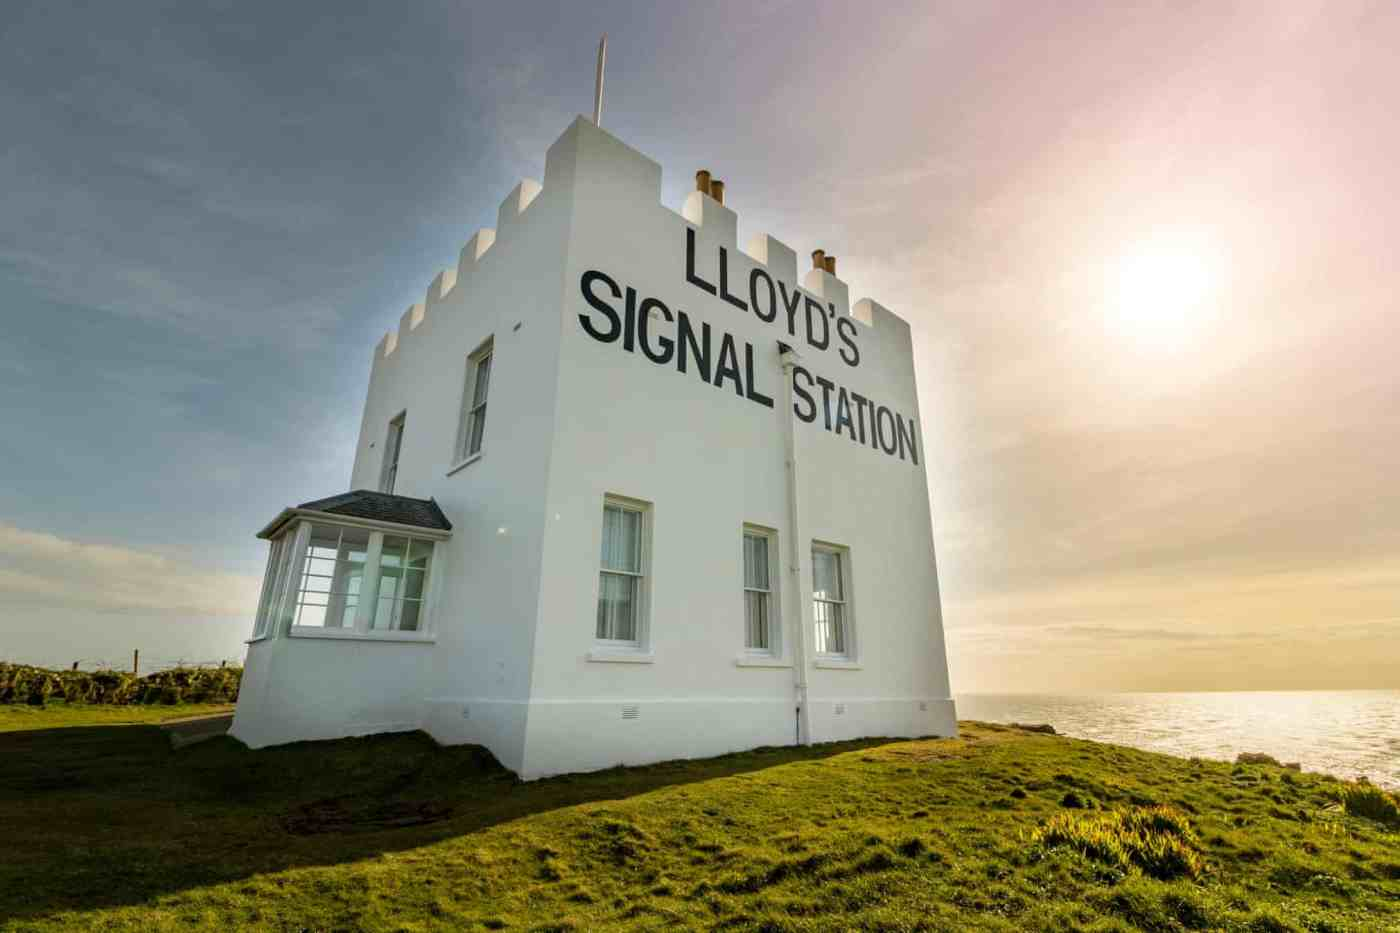 Lloyd's Signal Station in Cornwall UK